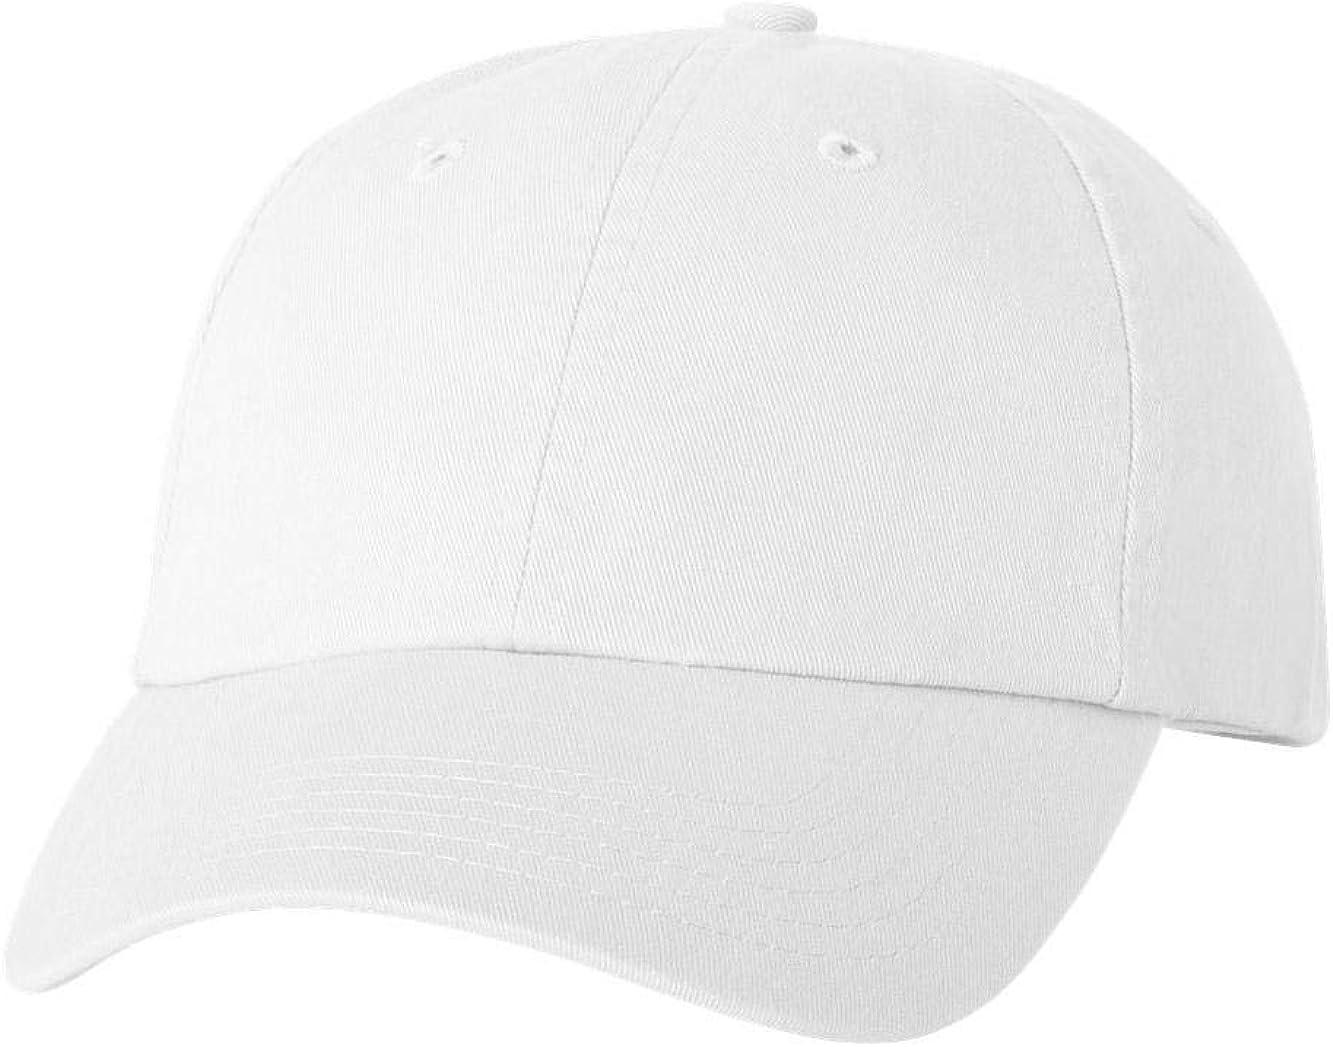 Valucap Bio-washed Cap